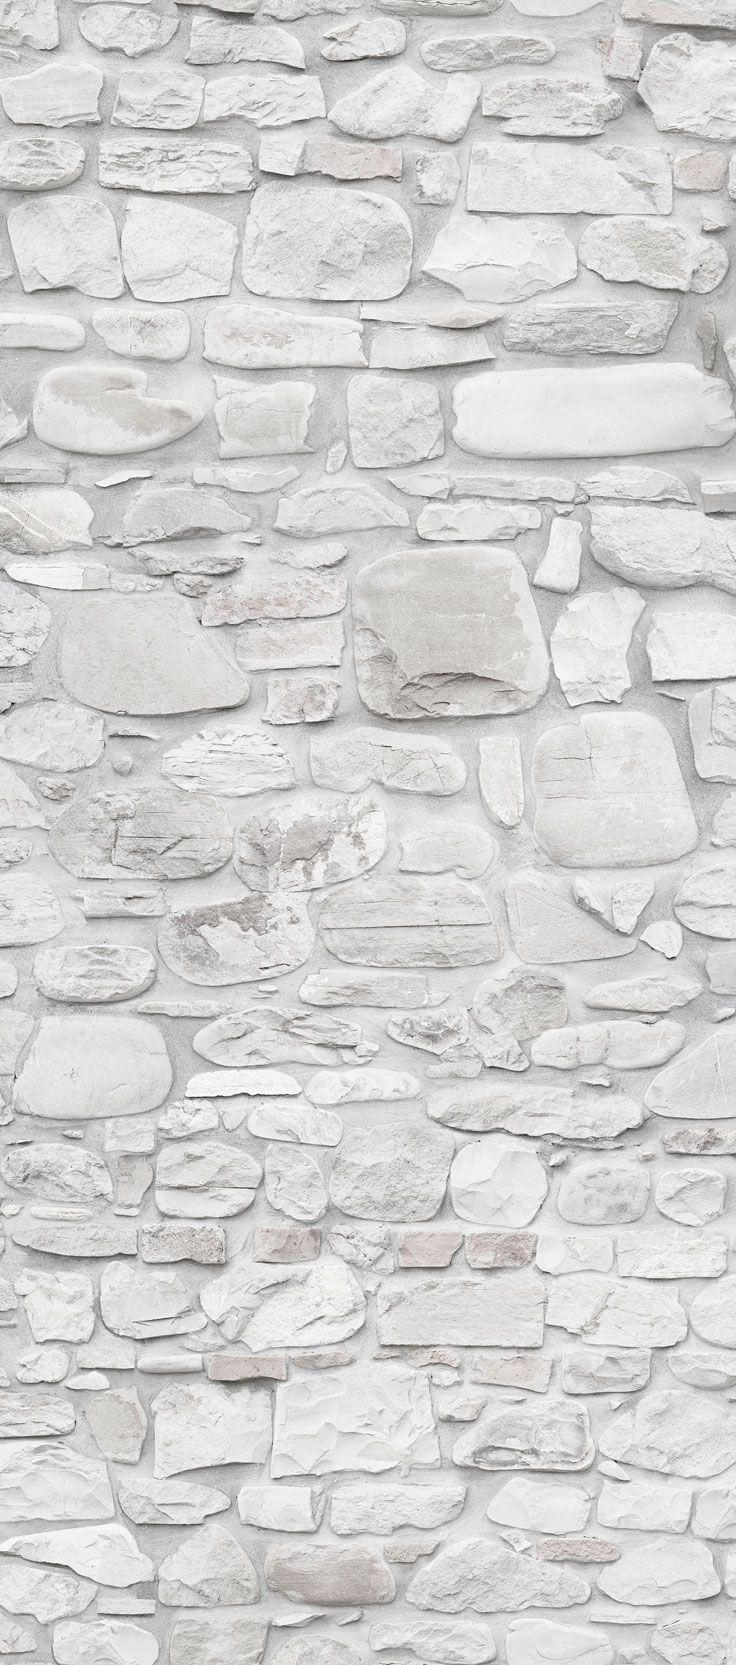 Carta da parati wall paper stonewall grey fondo for Carta da parati moderna bianca e nera